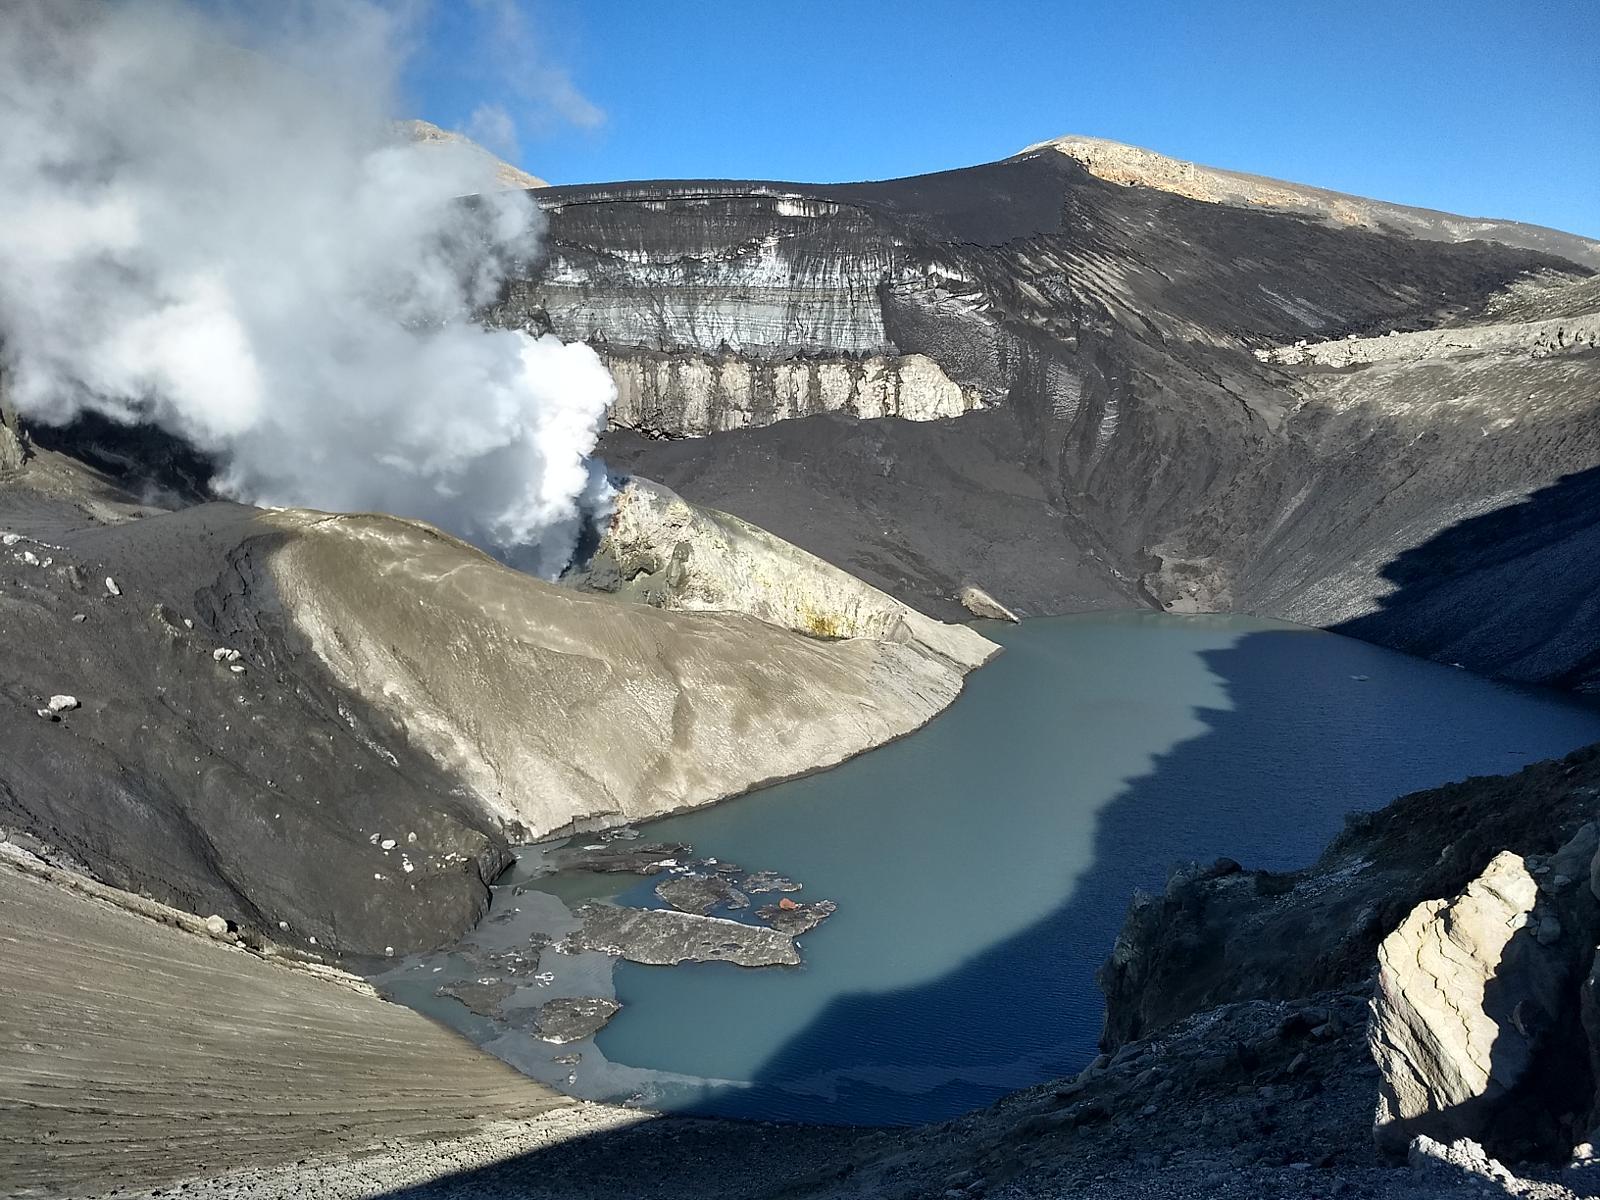 July 10, 2021. EN. Chile : Copahue , Italy / Sicily : Etna , Alaska : Pavlof , Indonesia : Merapi , Nicaragua : Telica .